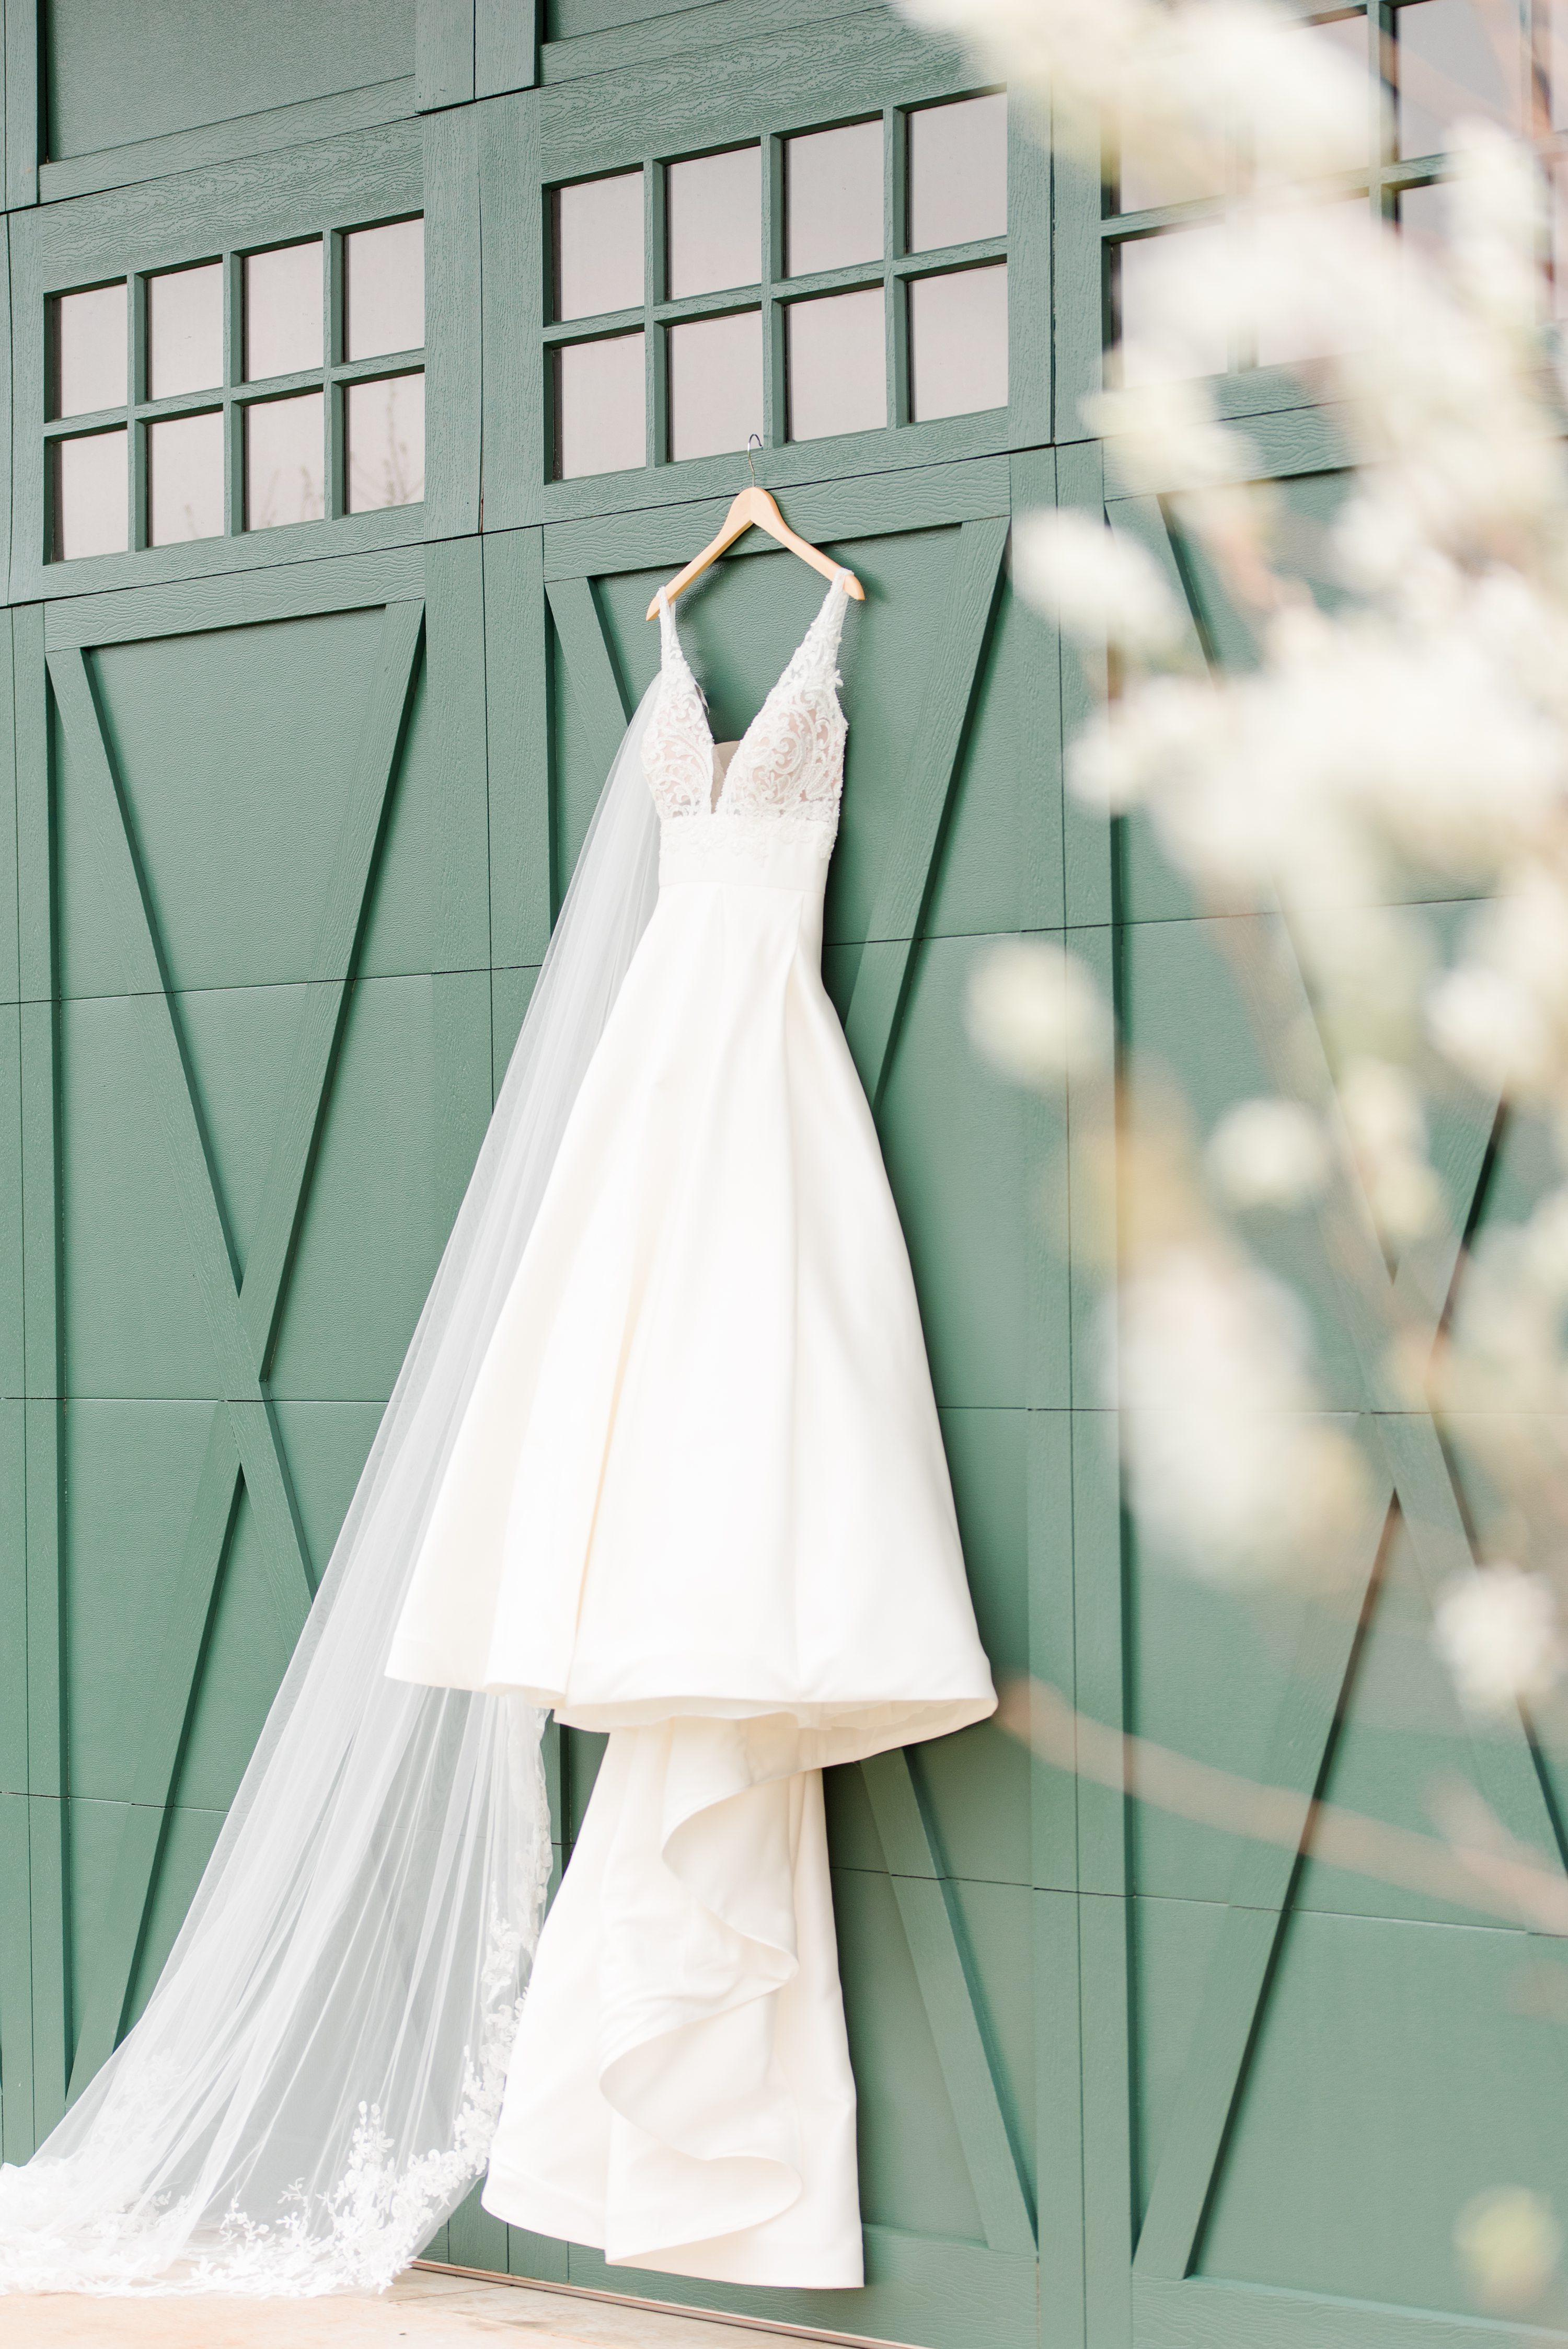 Barn at Edgewood,Wedding Dress,Outdoor Spring Wedding,Wedding Veil,Veil,Dress